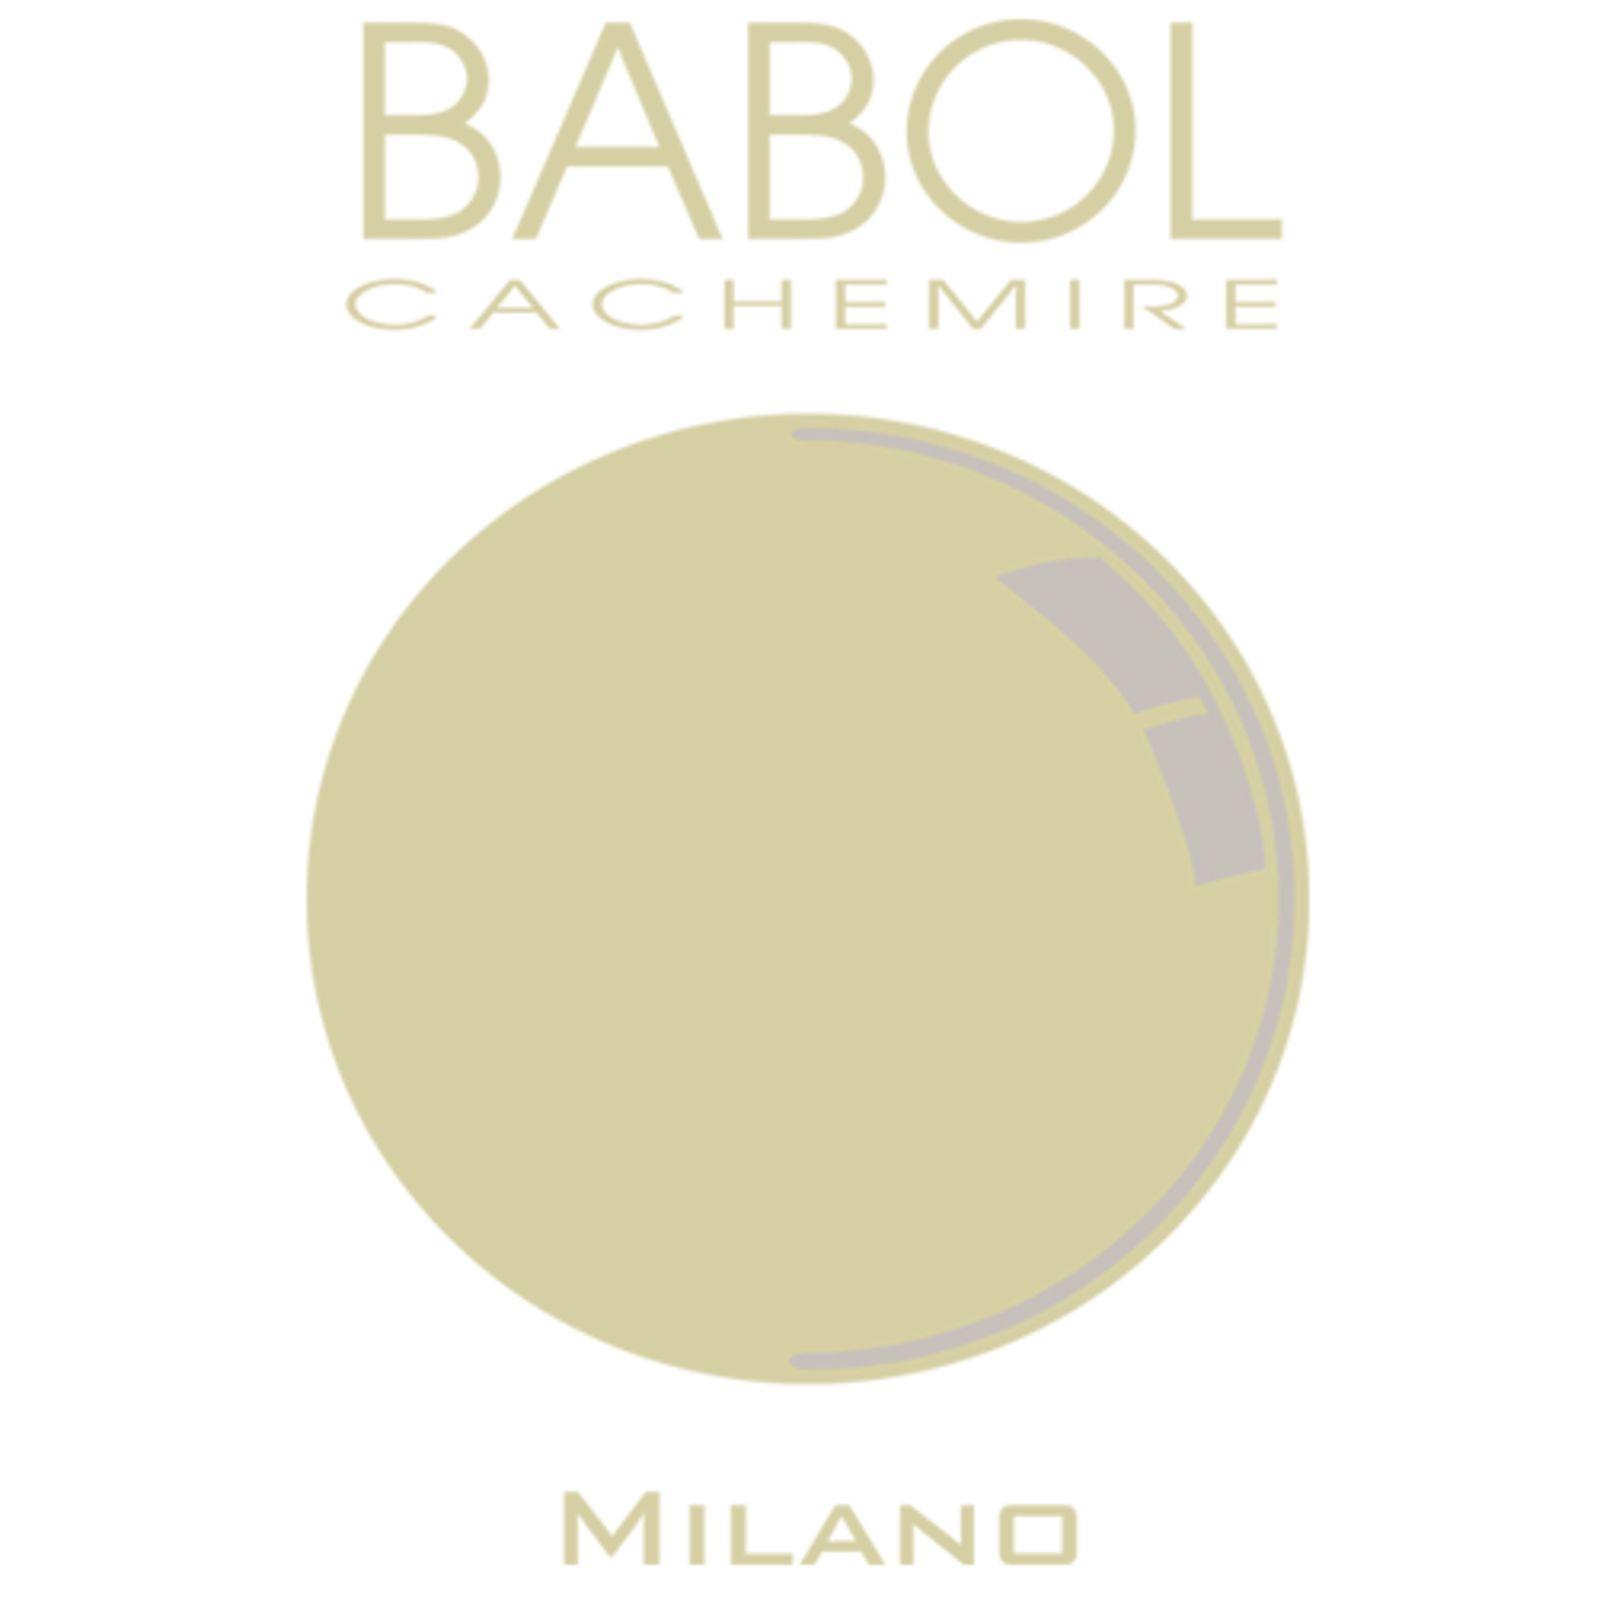 BABOL CACHEMIRE